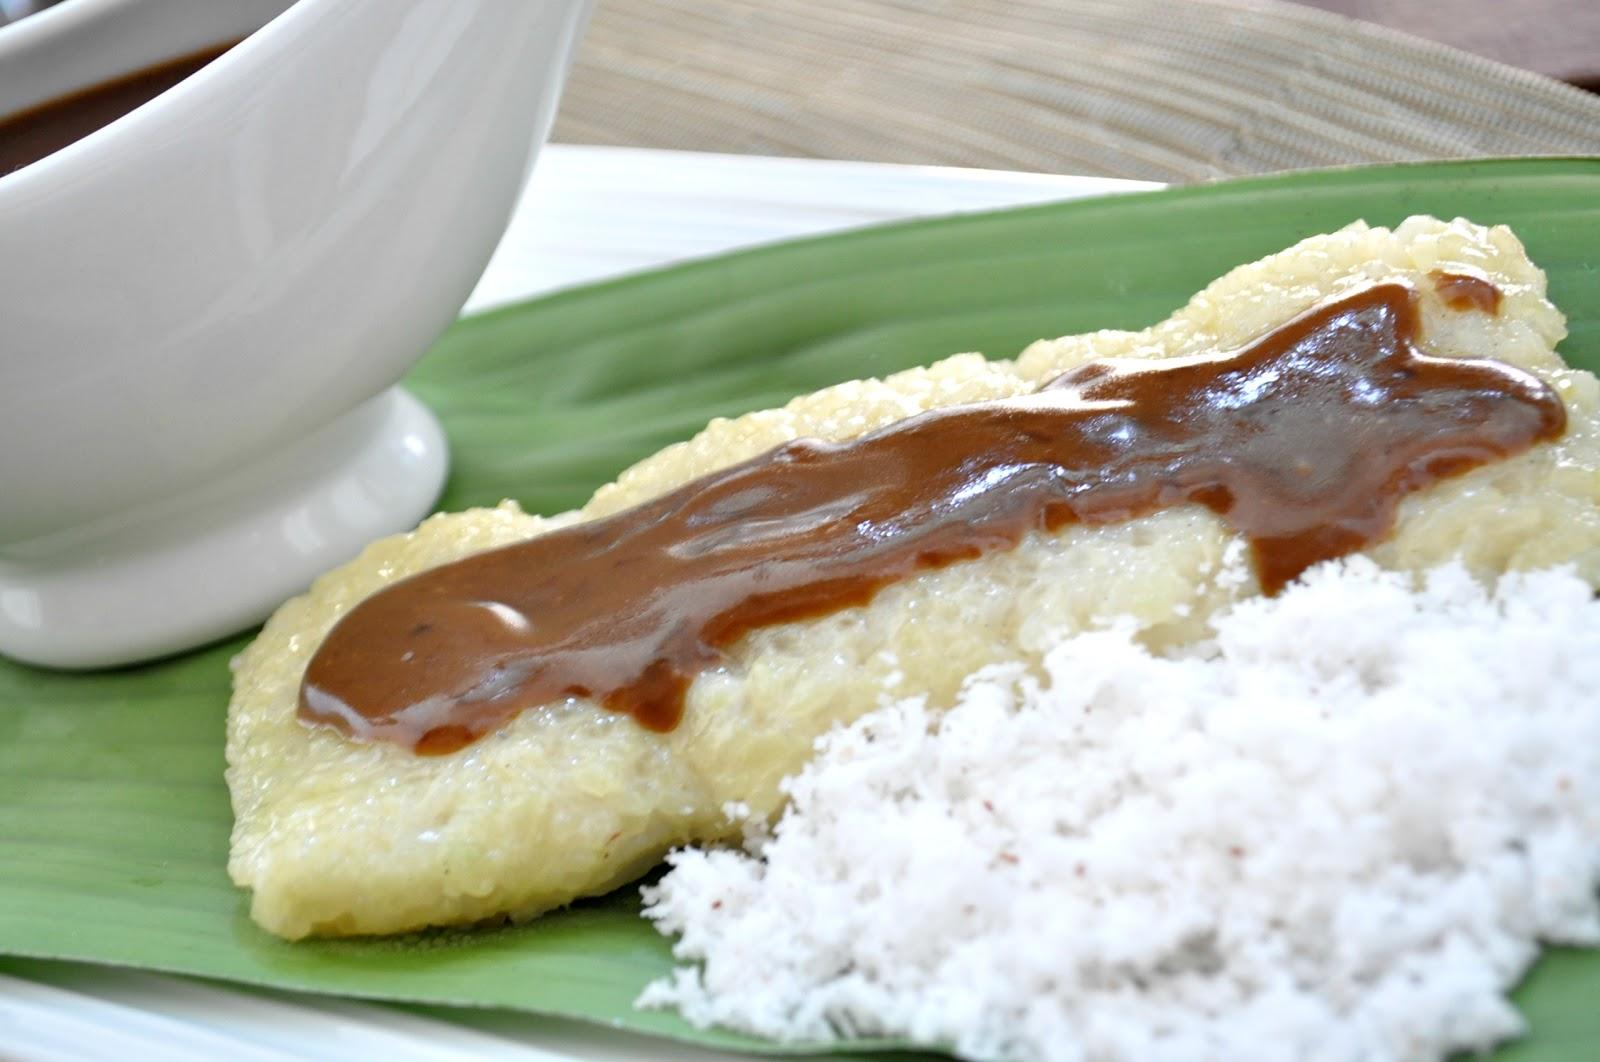 Cake Images With Name Suman : my twisted recipes: Suman sa Lihiya with Latik (Wrapped ...